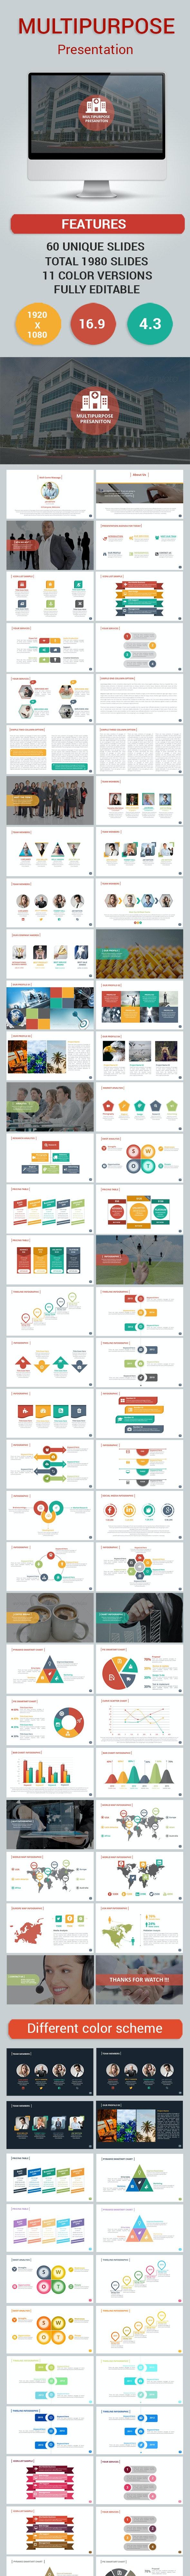 Multipurpose powerpoint presention - PowerPoint Templates Presentation Templates